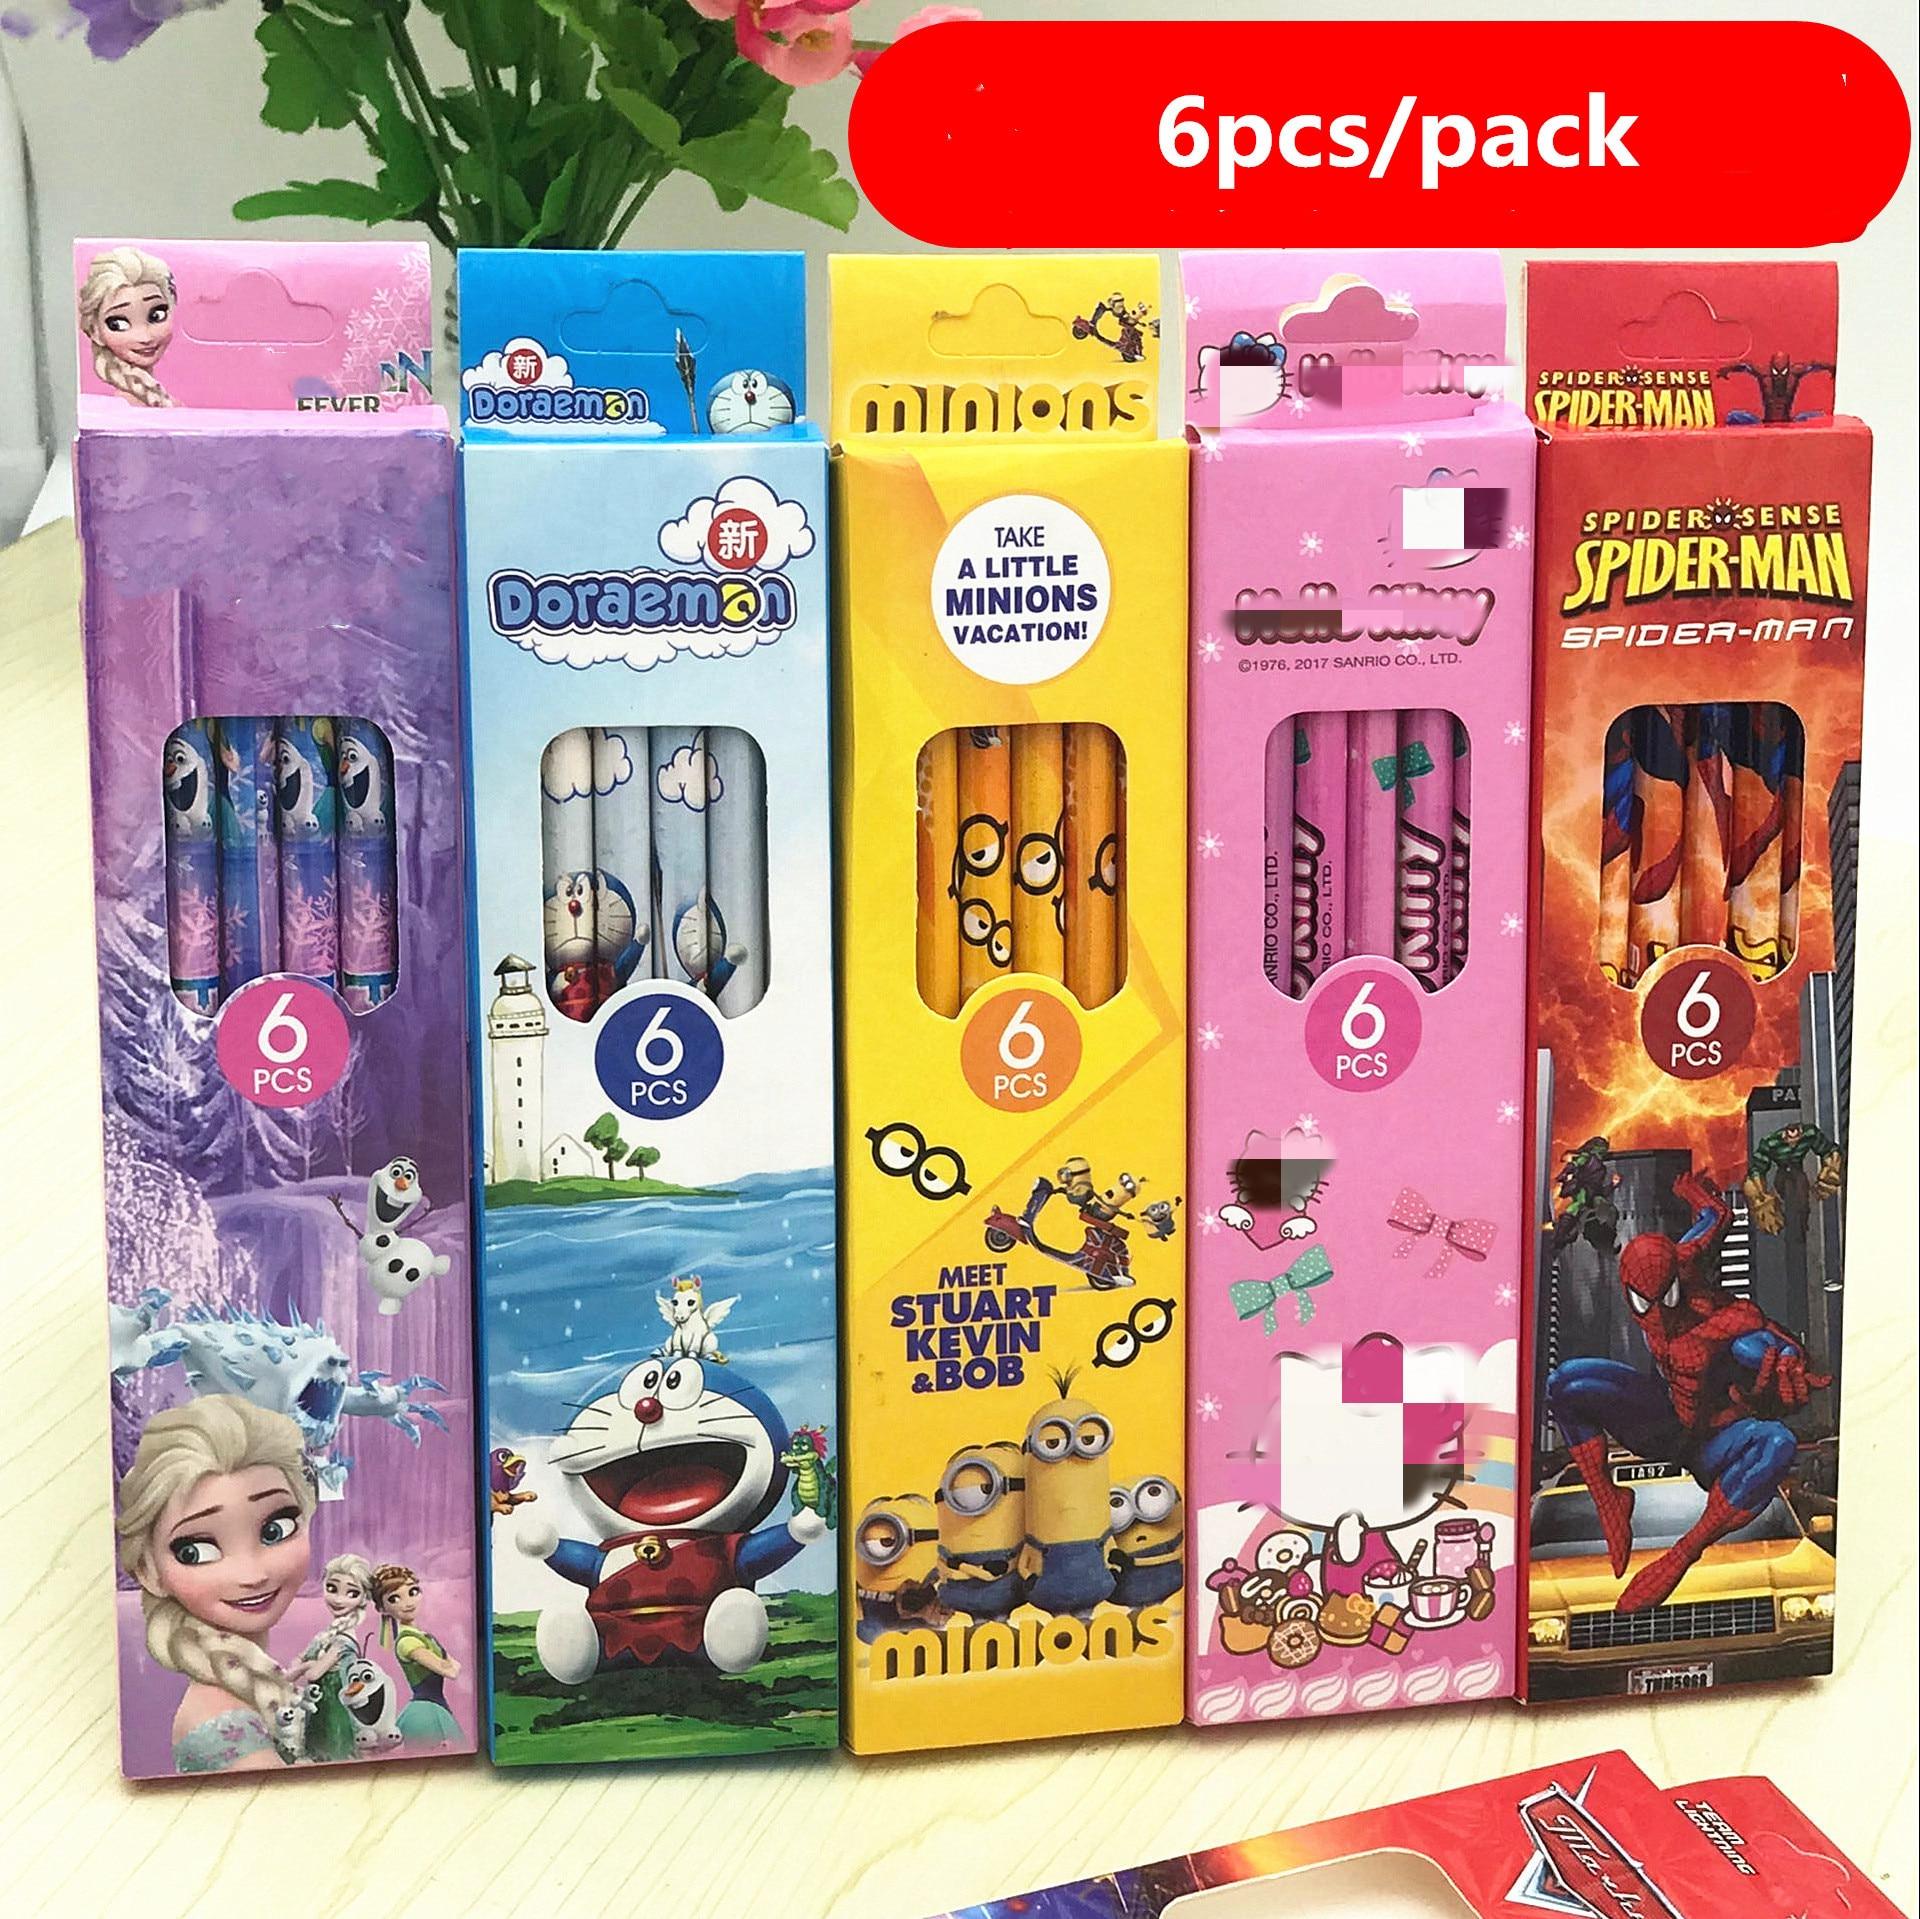 6pcs/pack Kawaii Cartoon Minions Micky HB Wood Pencils For Kids HB Sketch Pencil Children's Study School Stationery Supplies